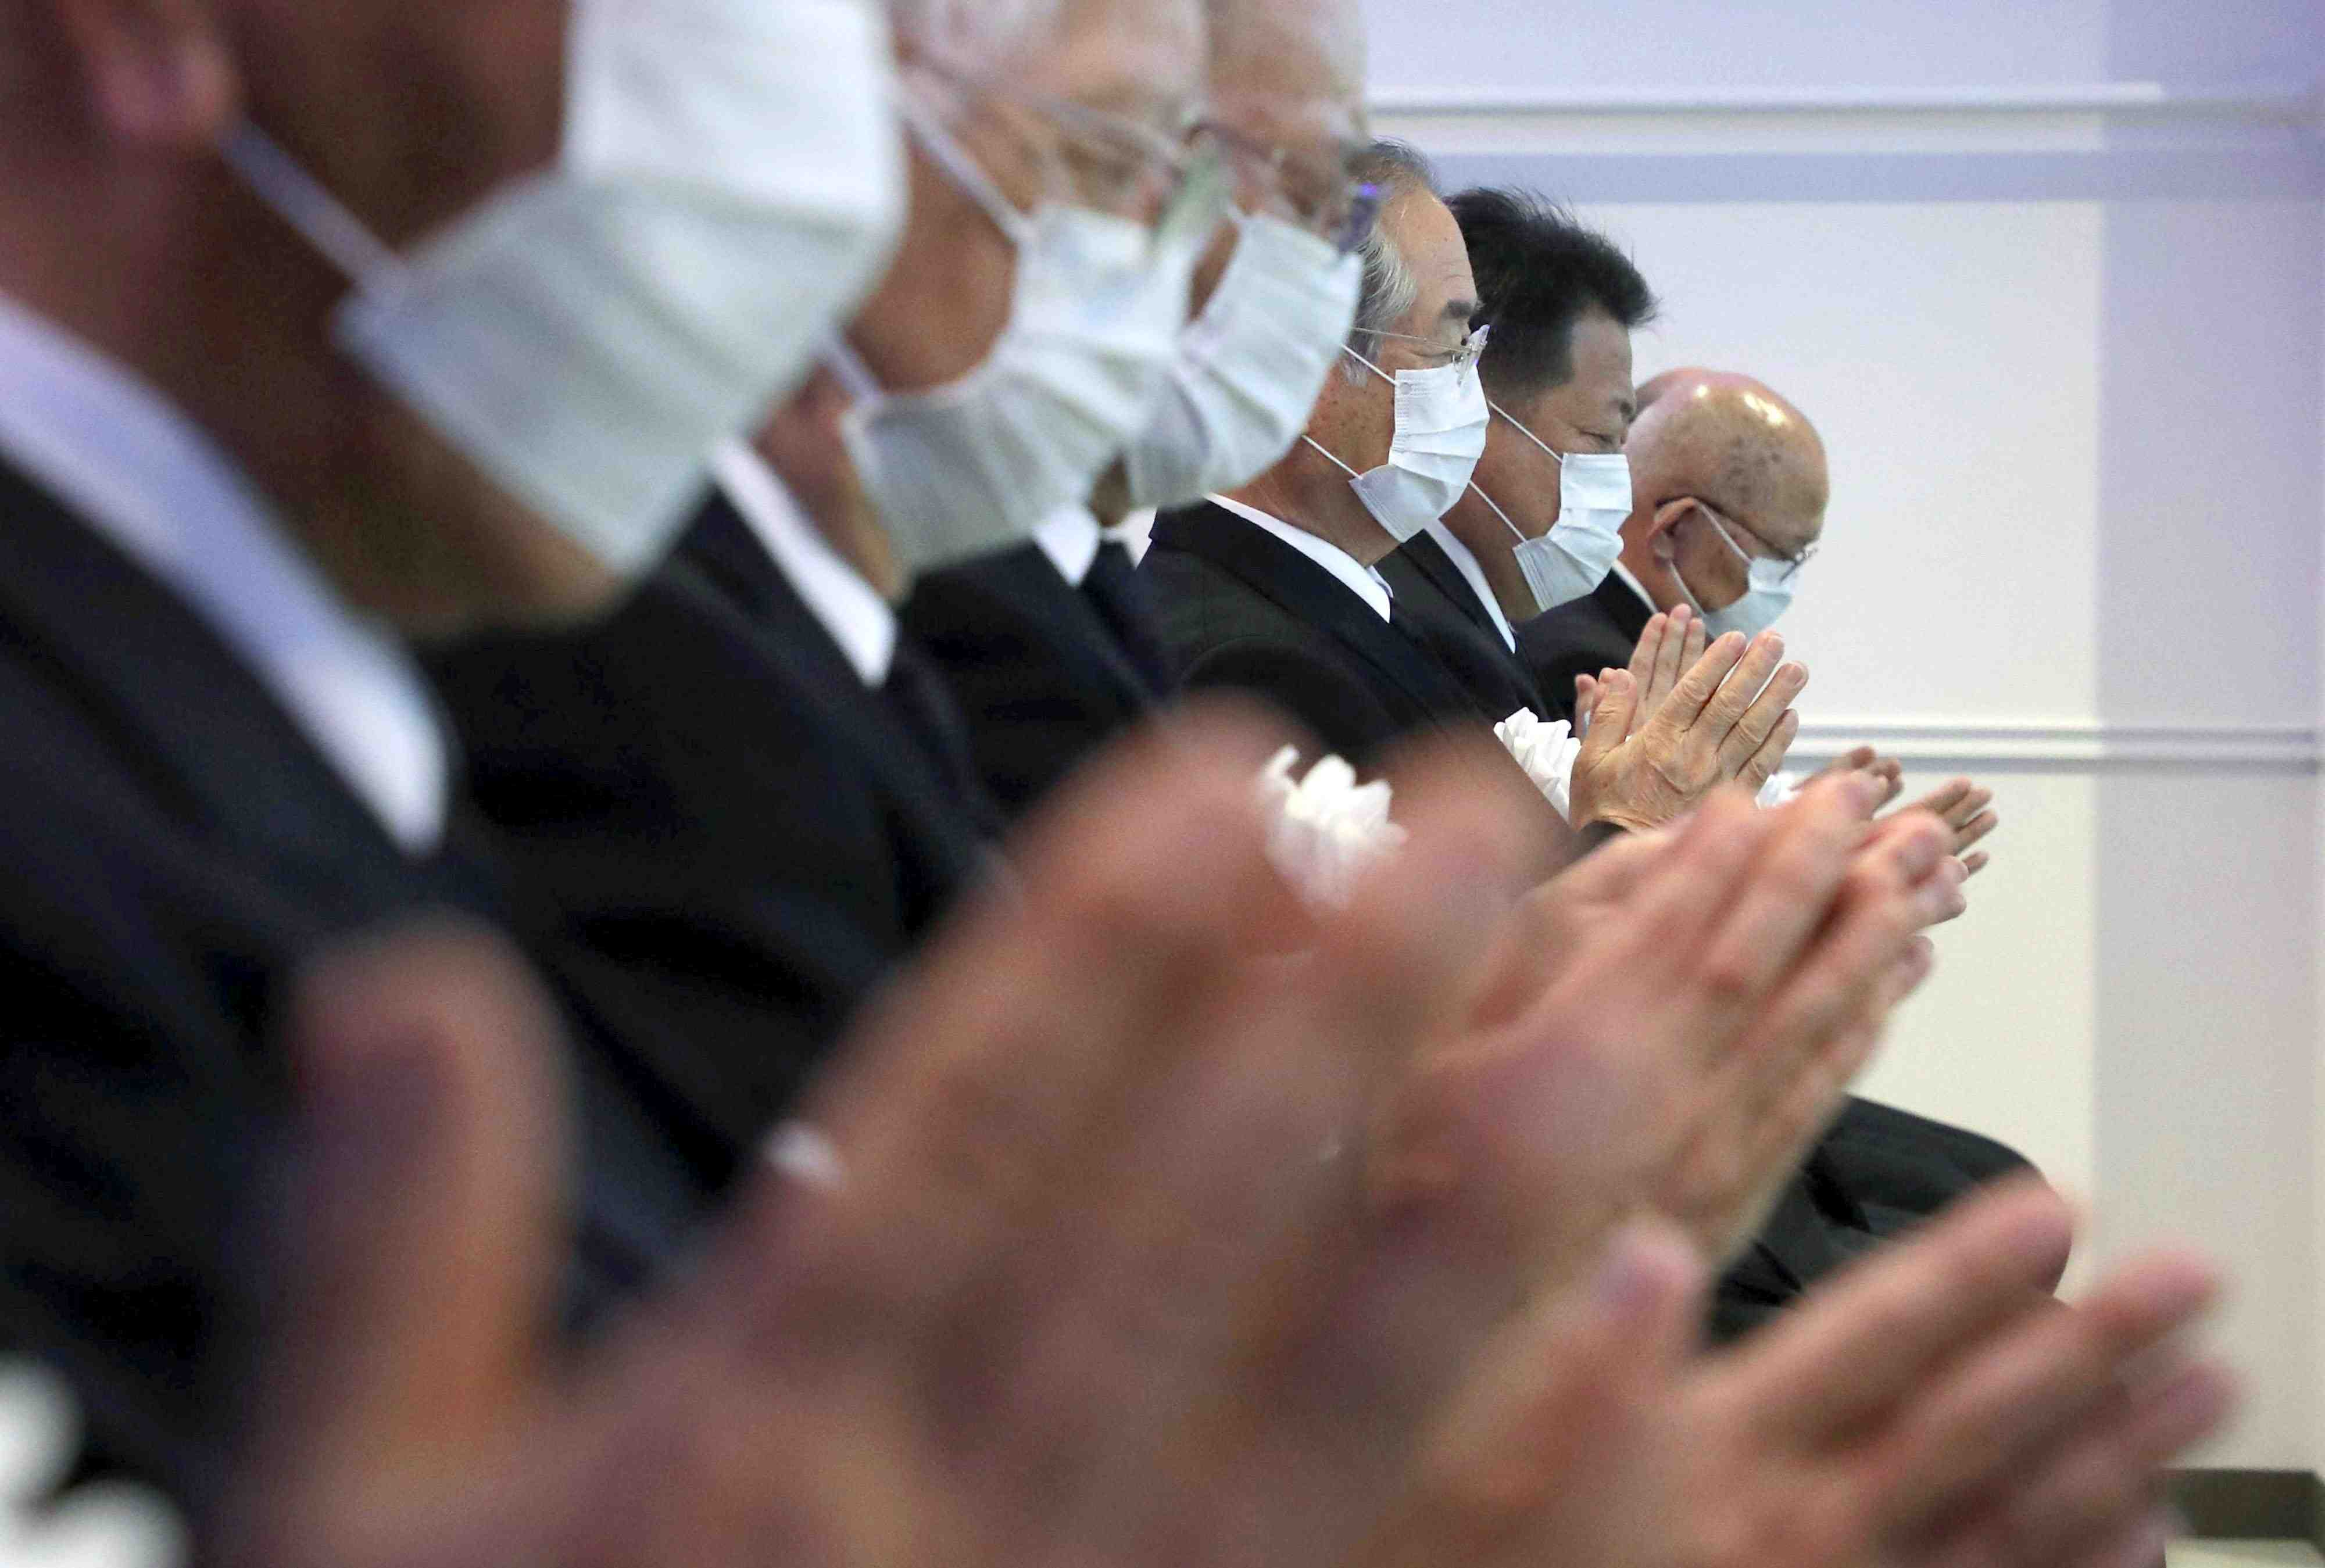 Japan 3.11 Anniversary The Great Tohoku Earthquake 041